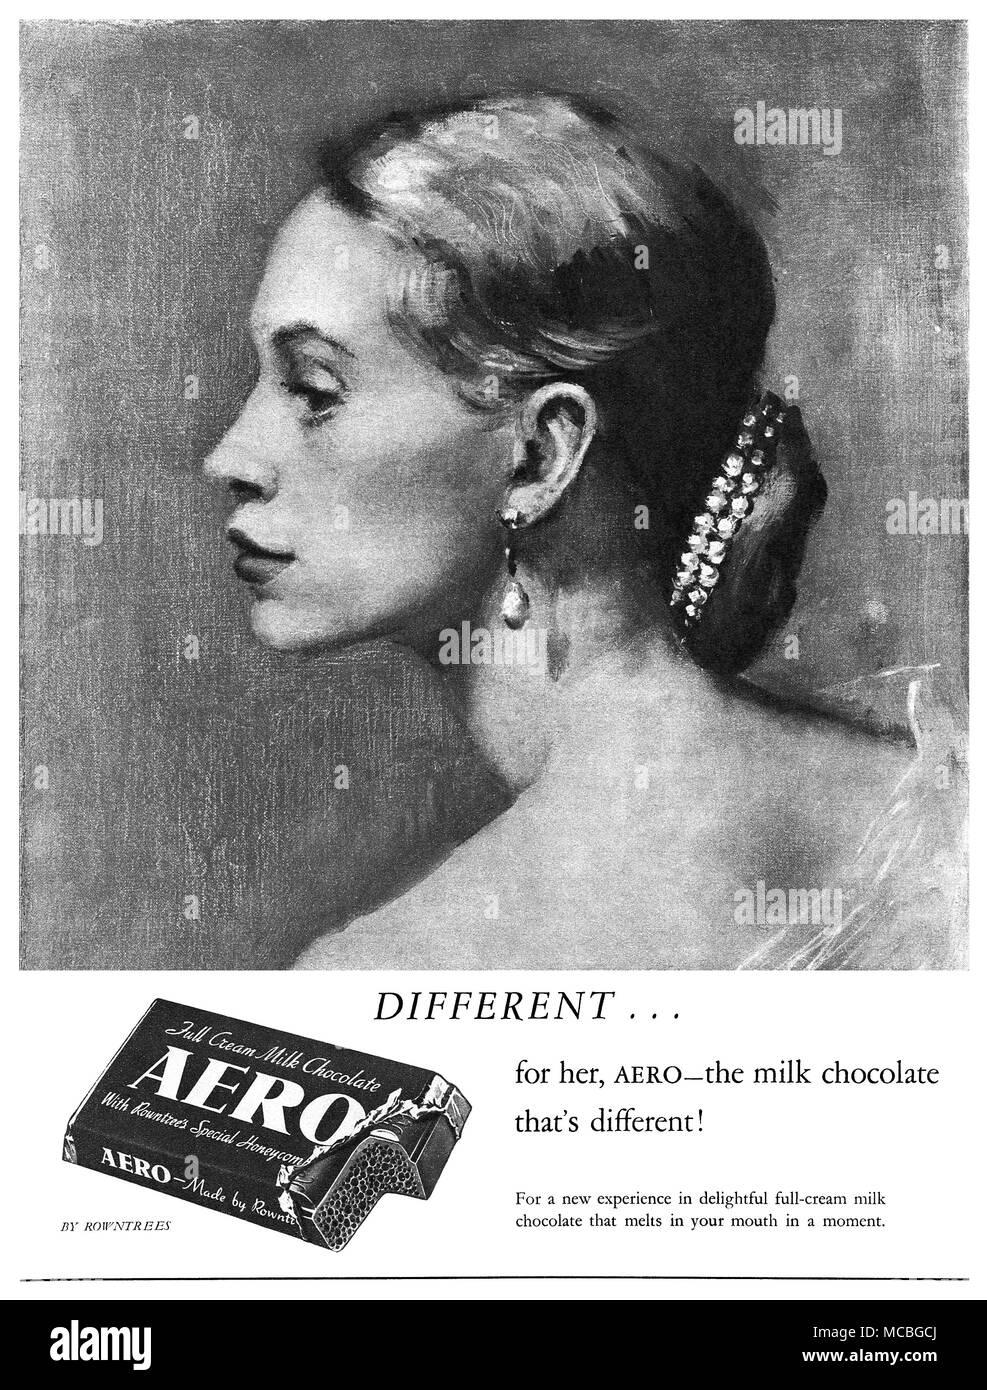 1951 British advertisement for Rowntrees Aero chocolate bar. - Stock Image